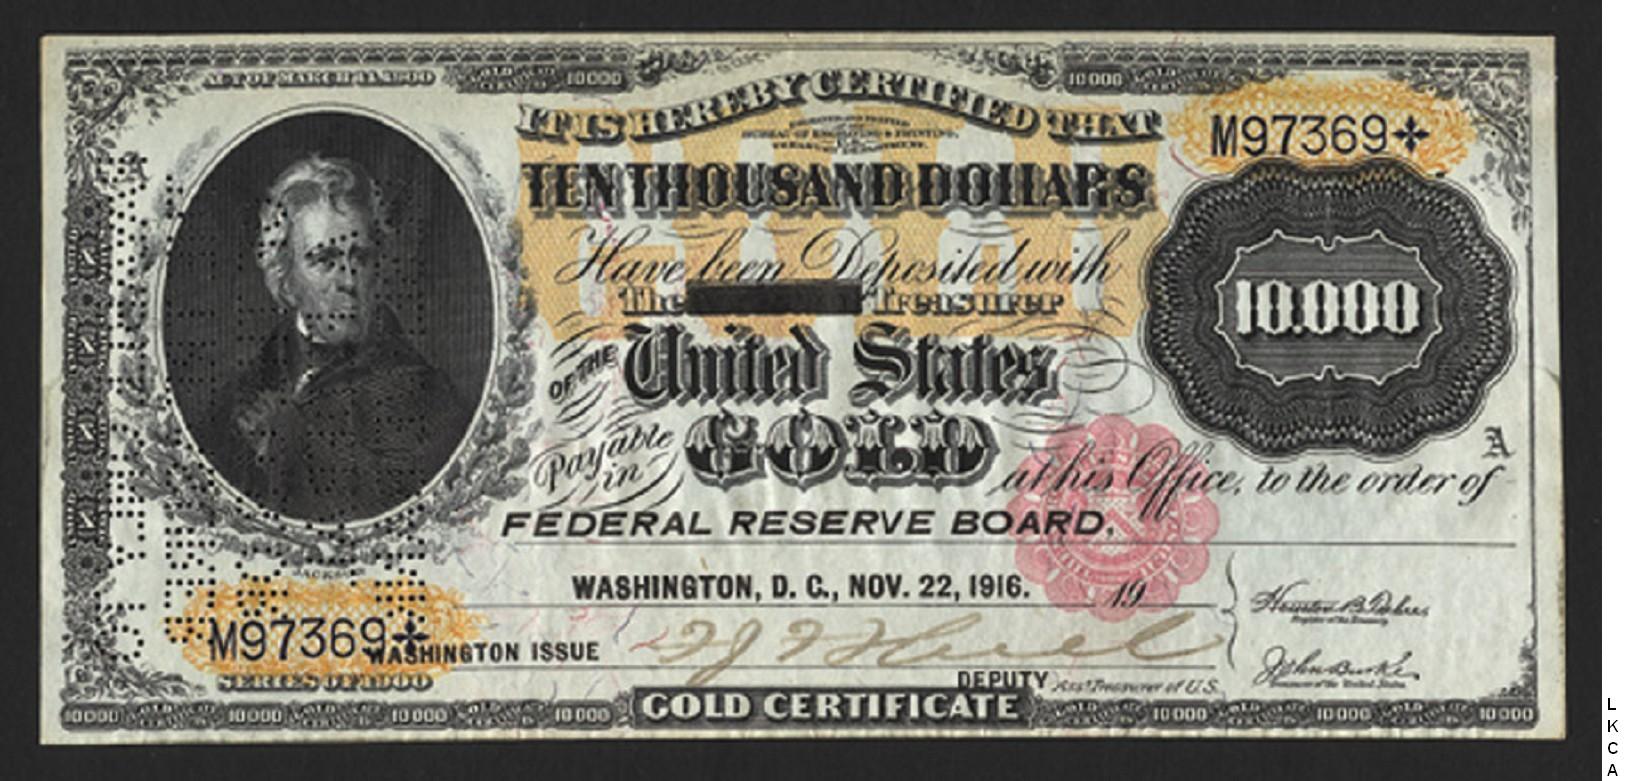 Large Size Gold Certificates 10000 Dollars